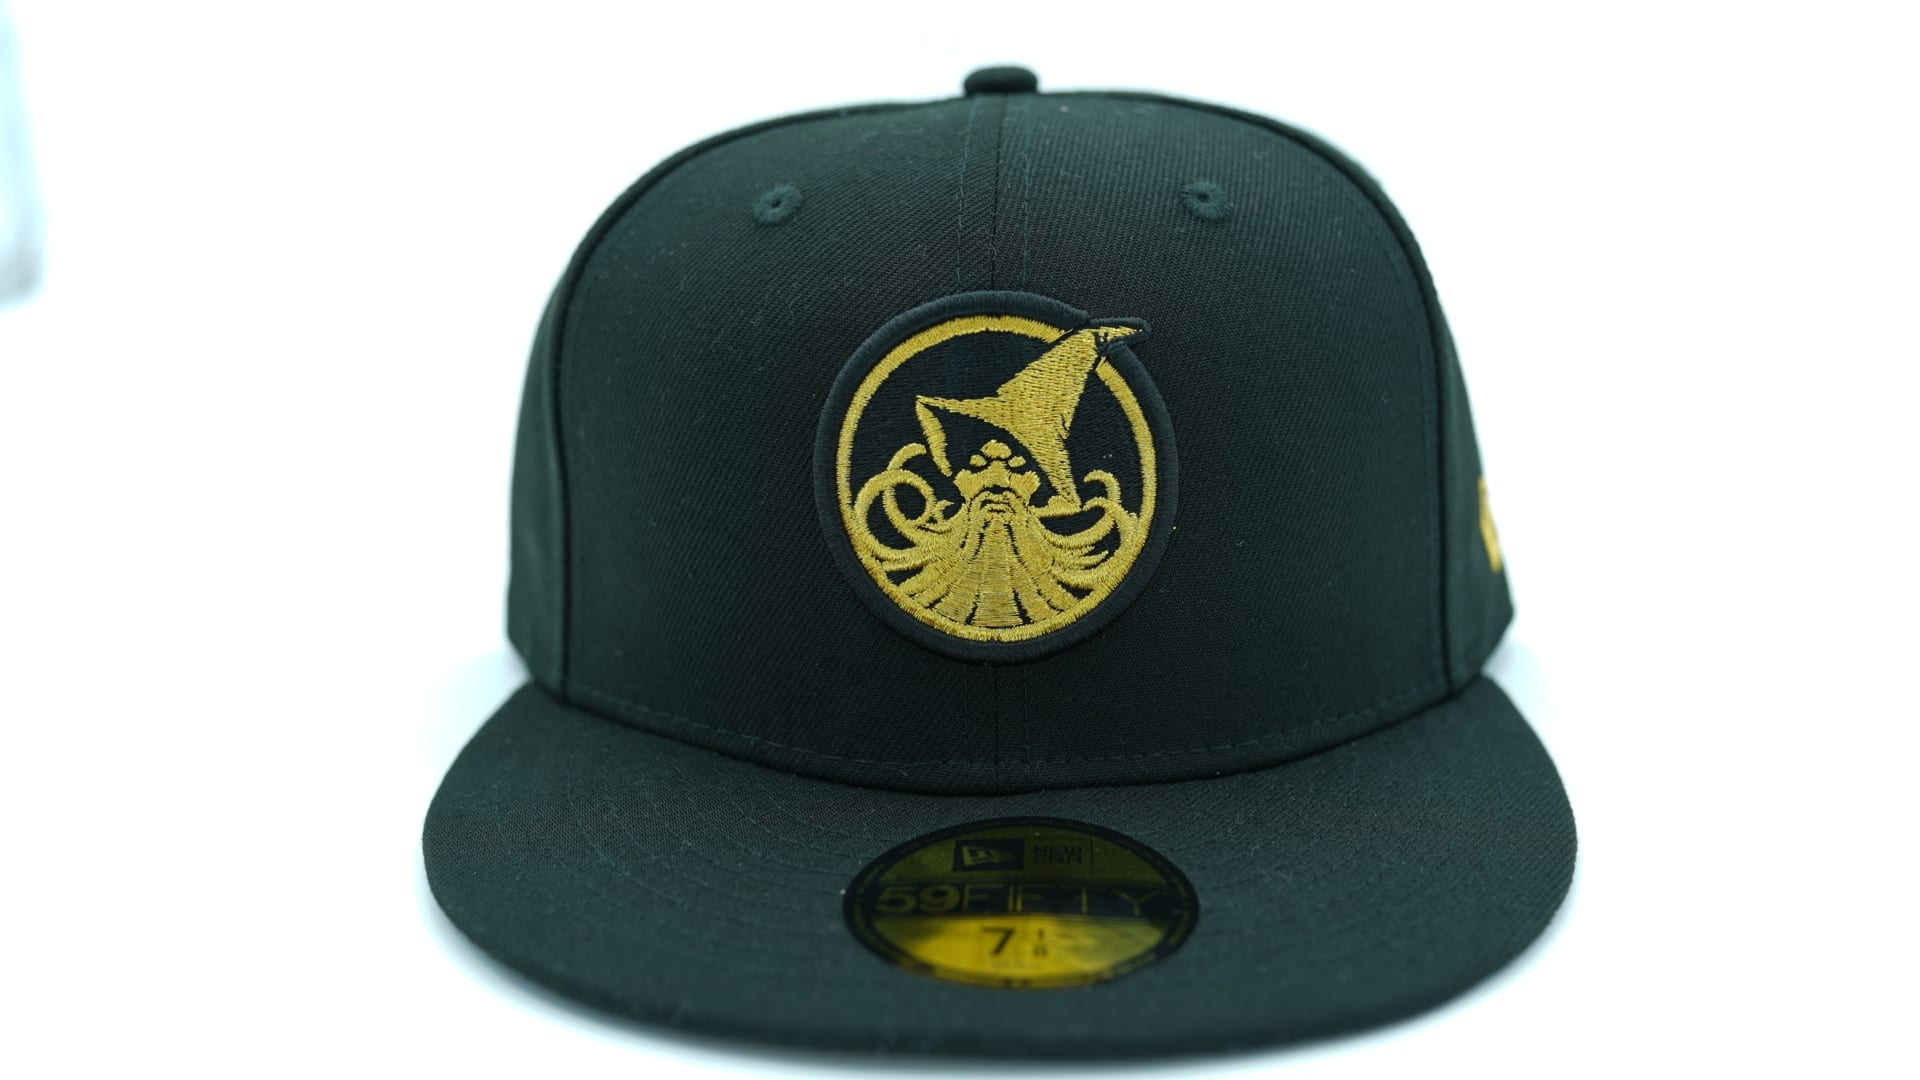 JORDAN-Retro-11-Fitted-Baseball-Cap-hat 3 906b76db56c